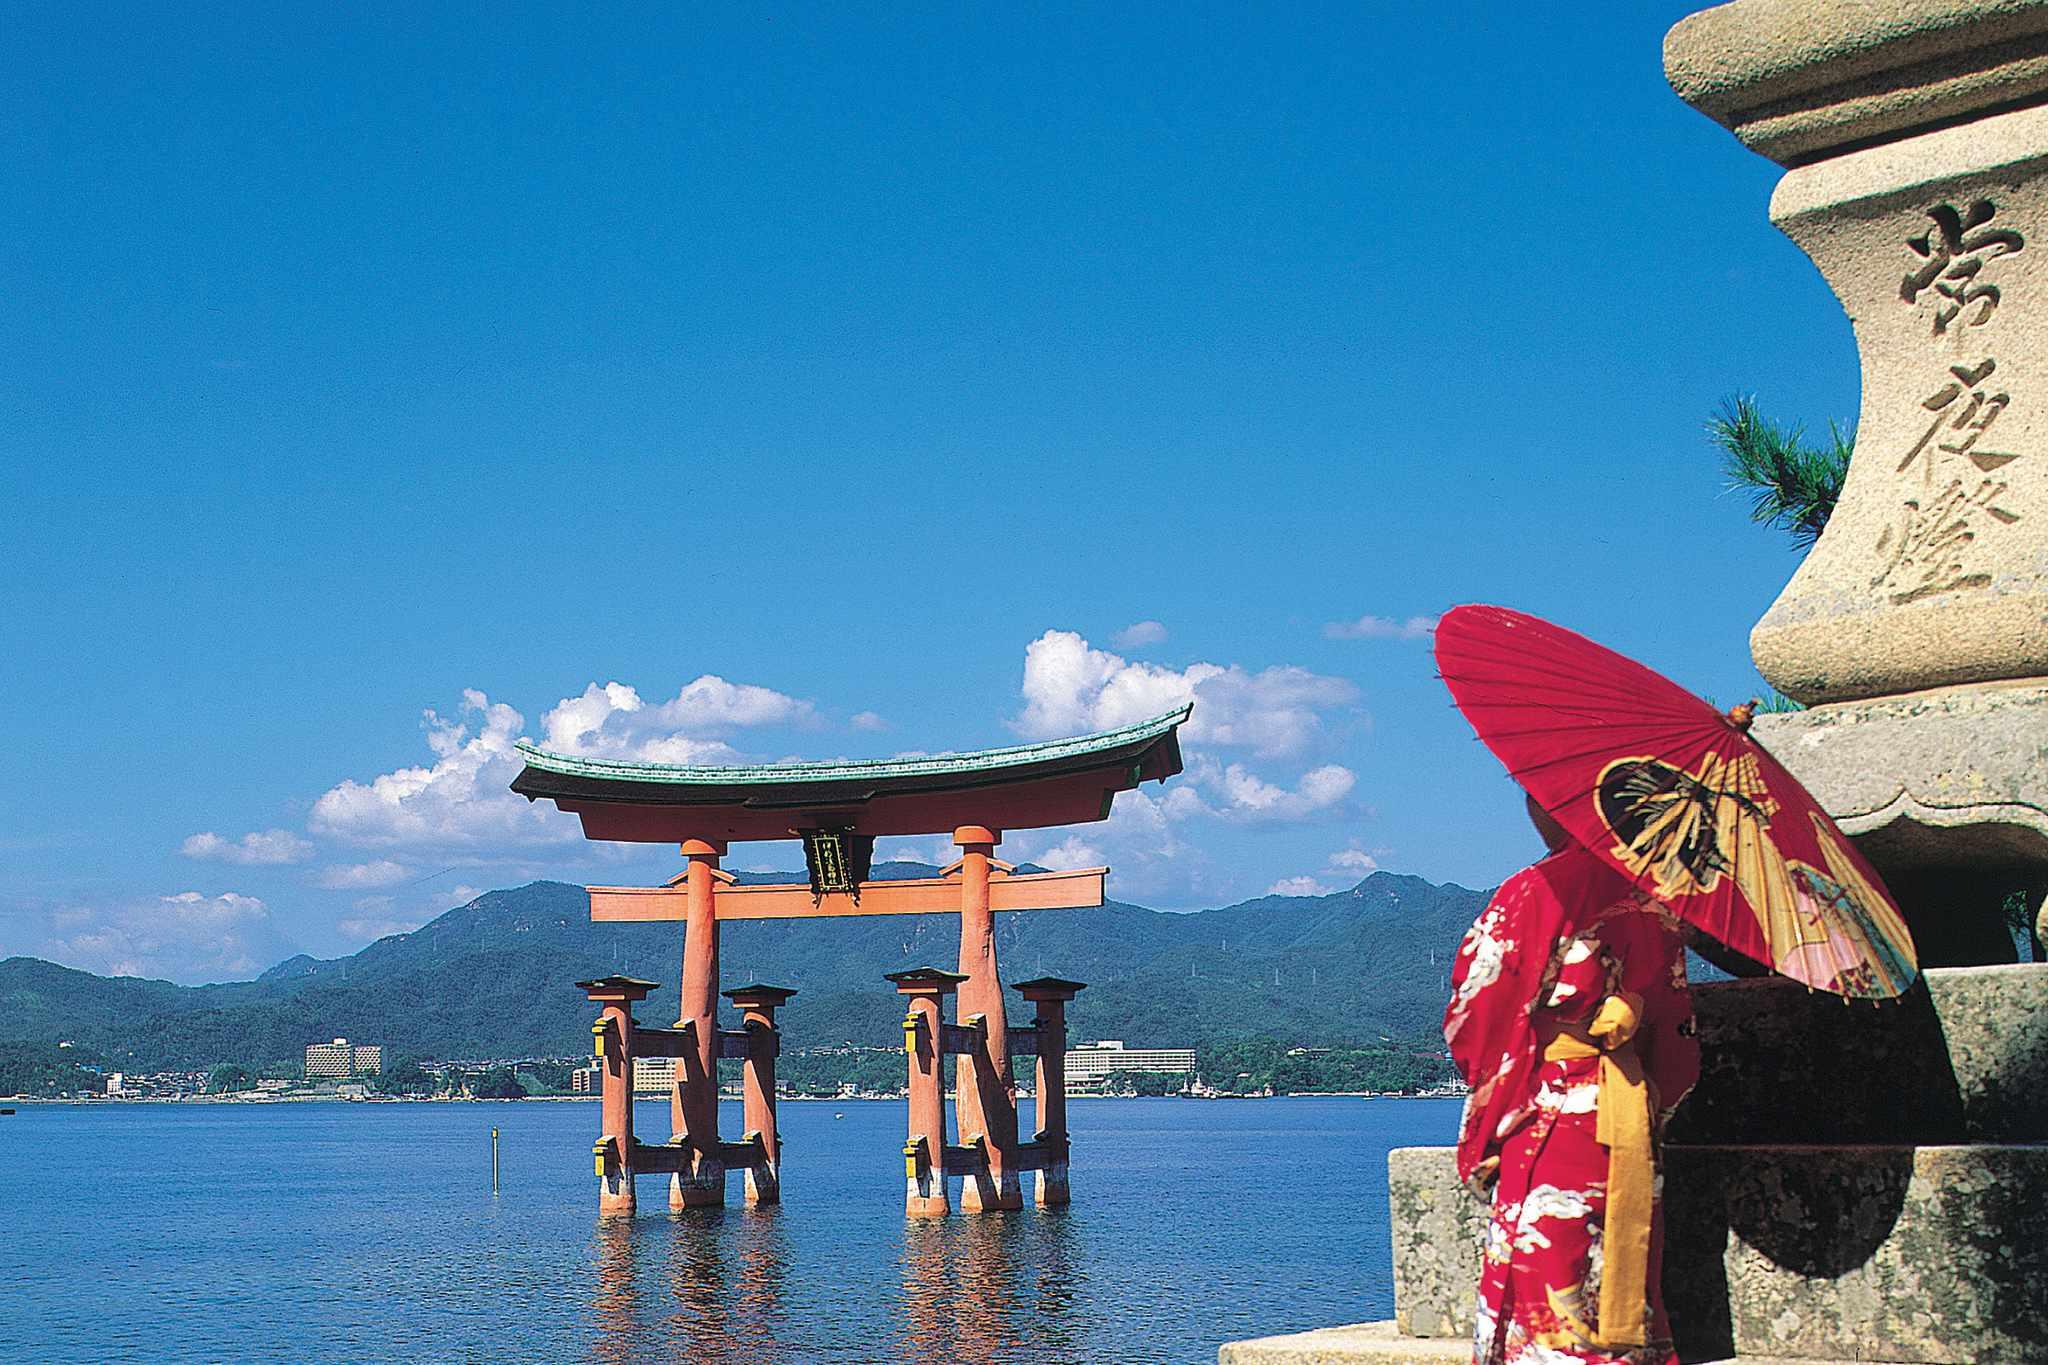 riviera-travel-miyajima-island-2048-1365